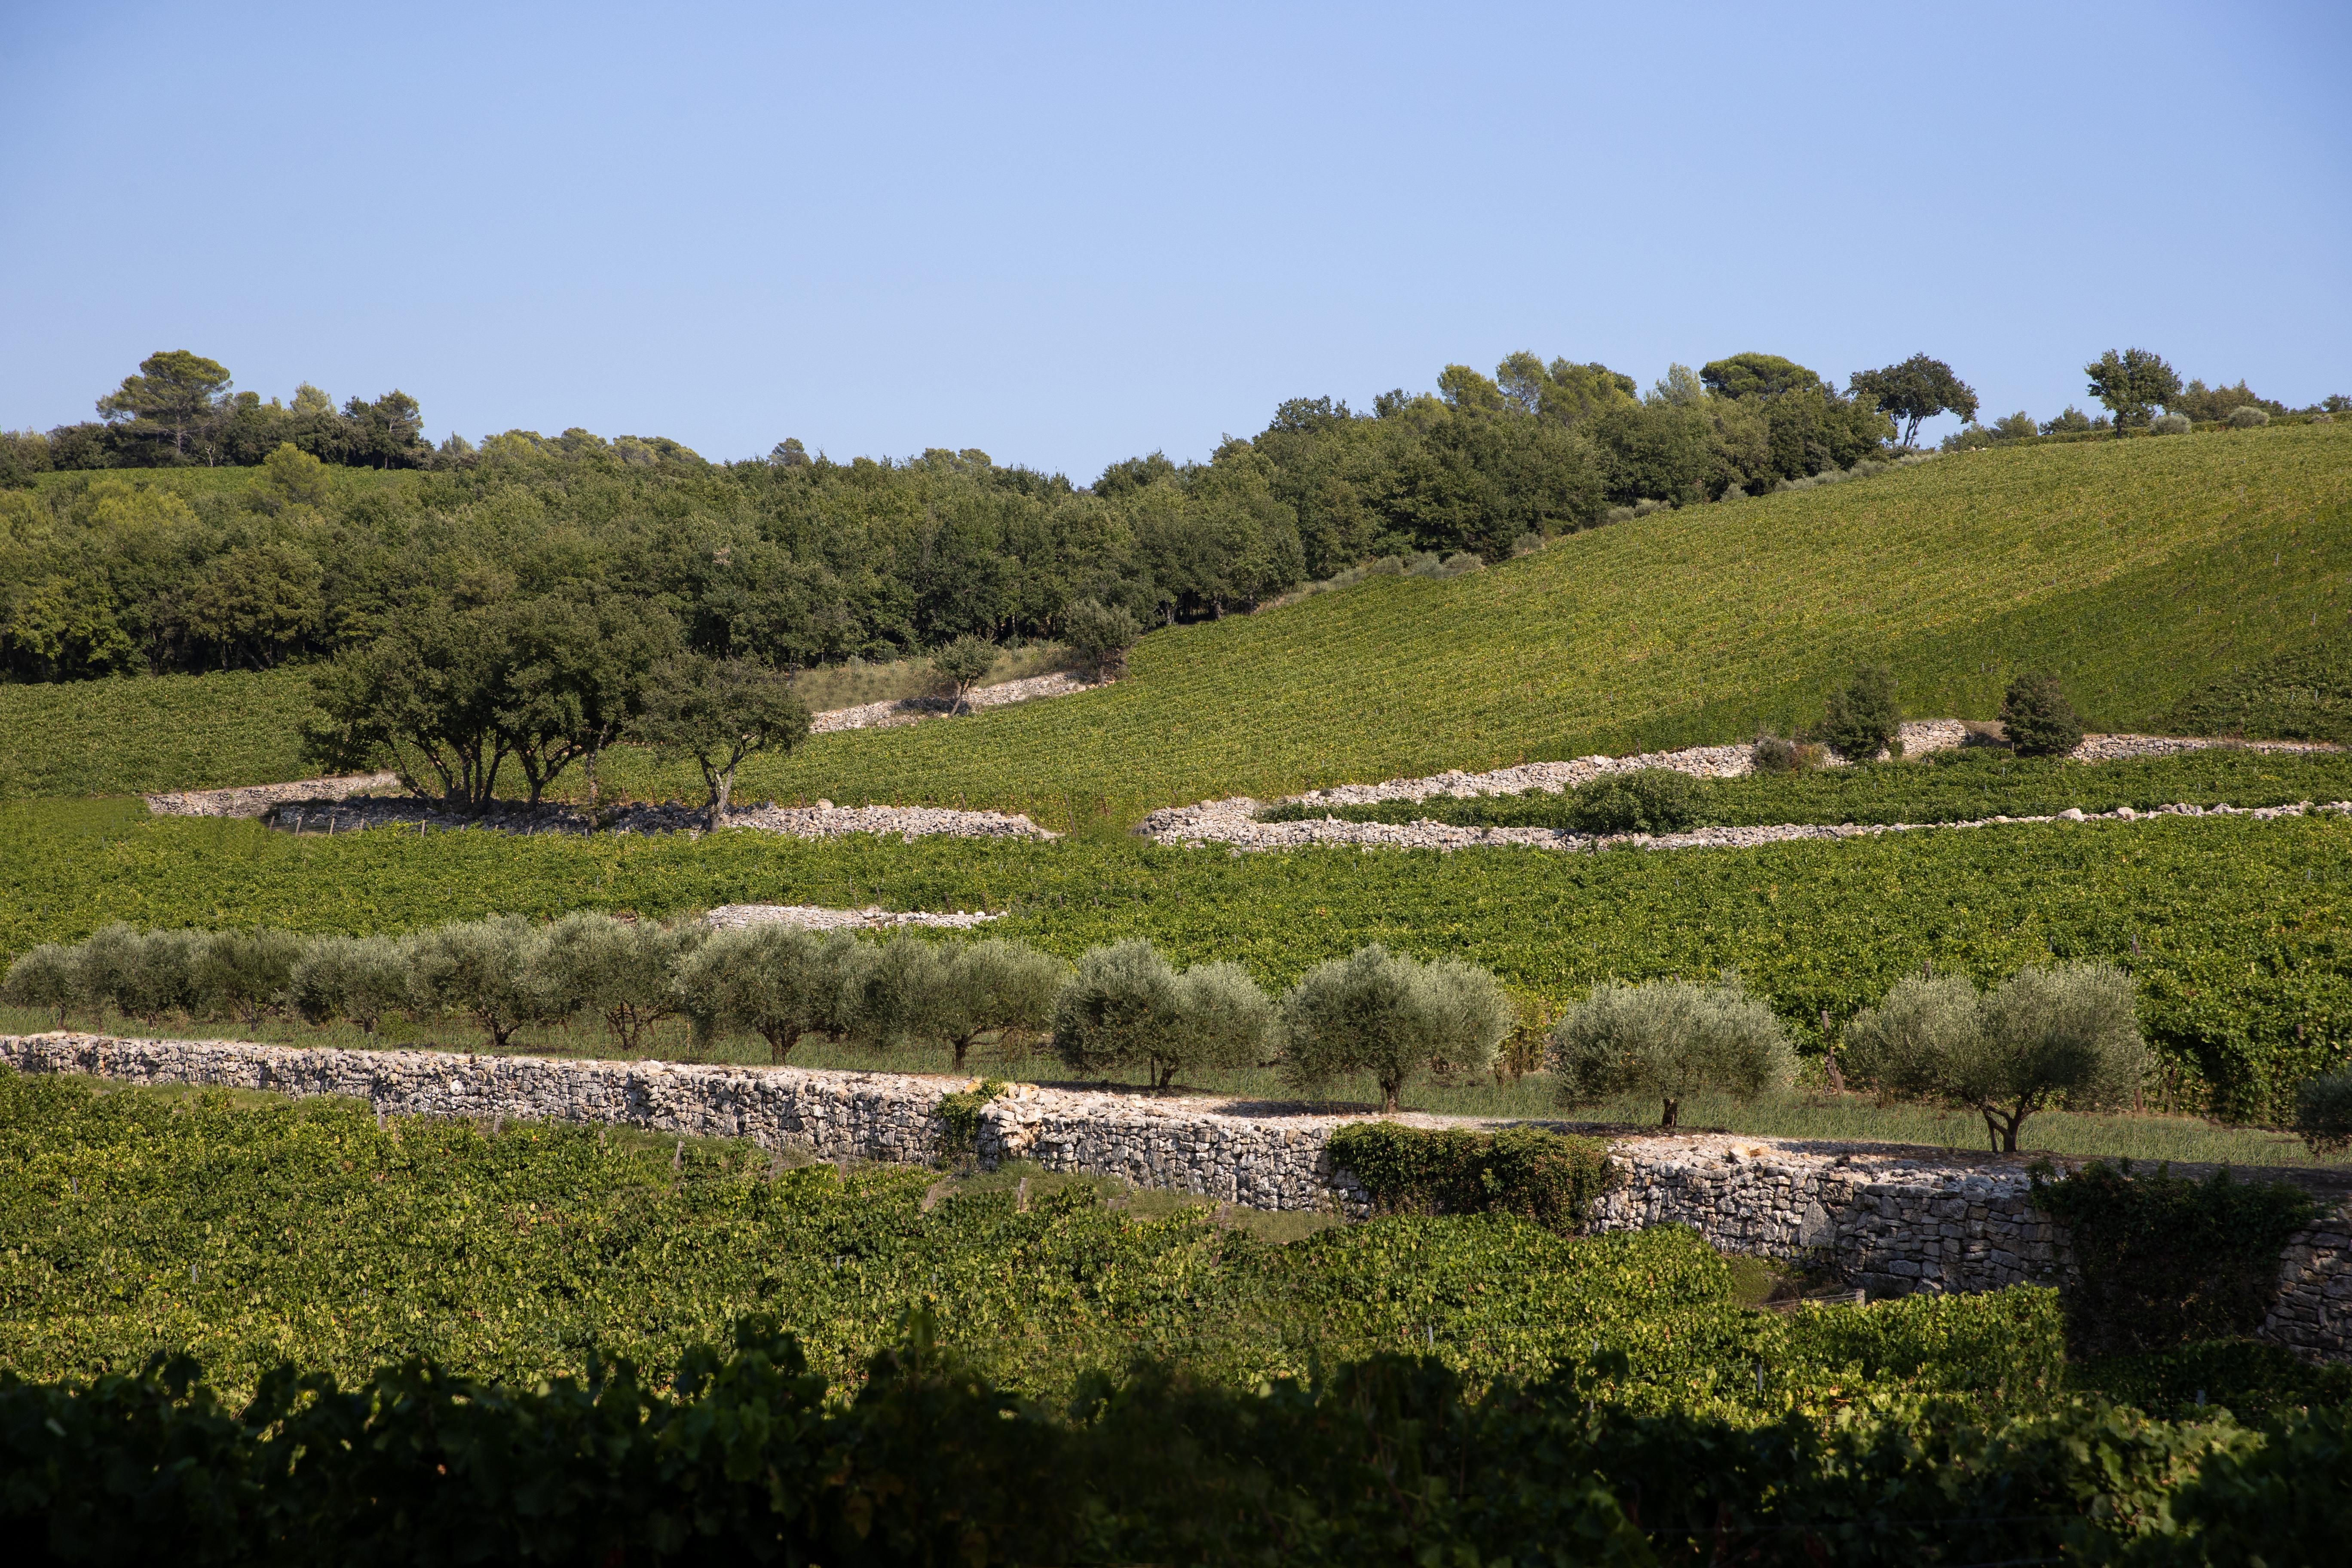 Vignes - Vines